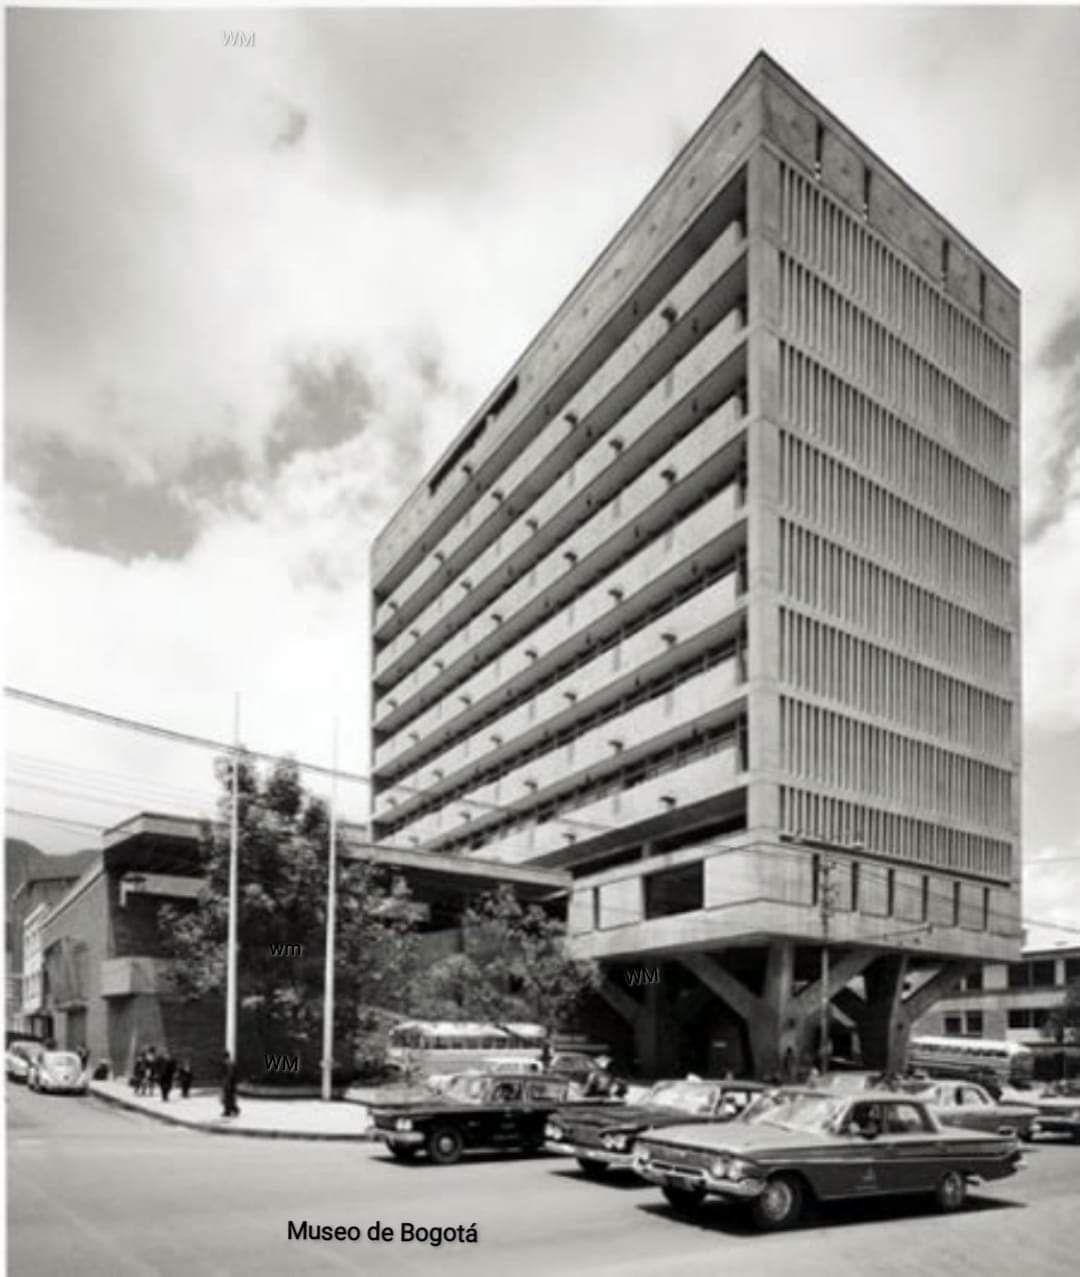 Historia Fotografica De Bogota Y Colombia On Twitter